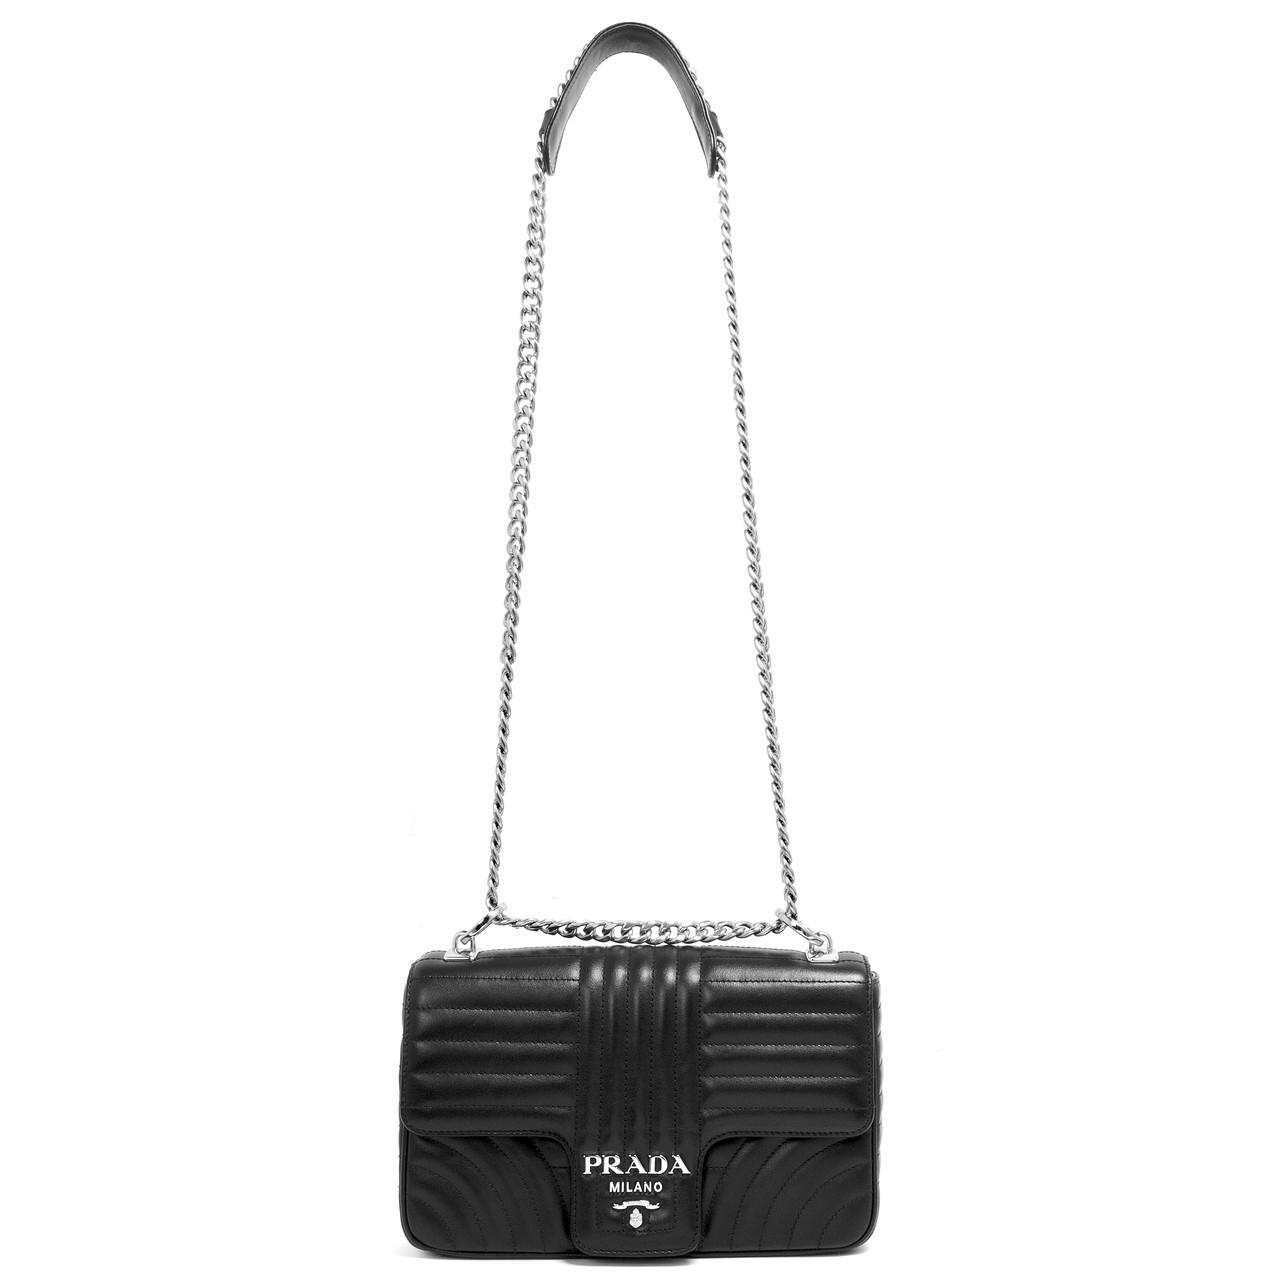 68a5d370a7 Prada Nero Soft Calfskin Medium Diagramme Flap Shoulder Bag - modaselle